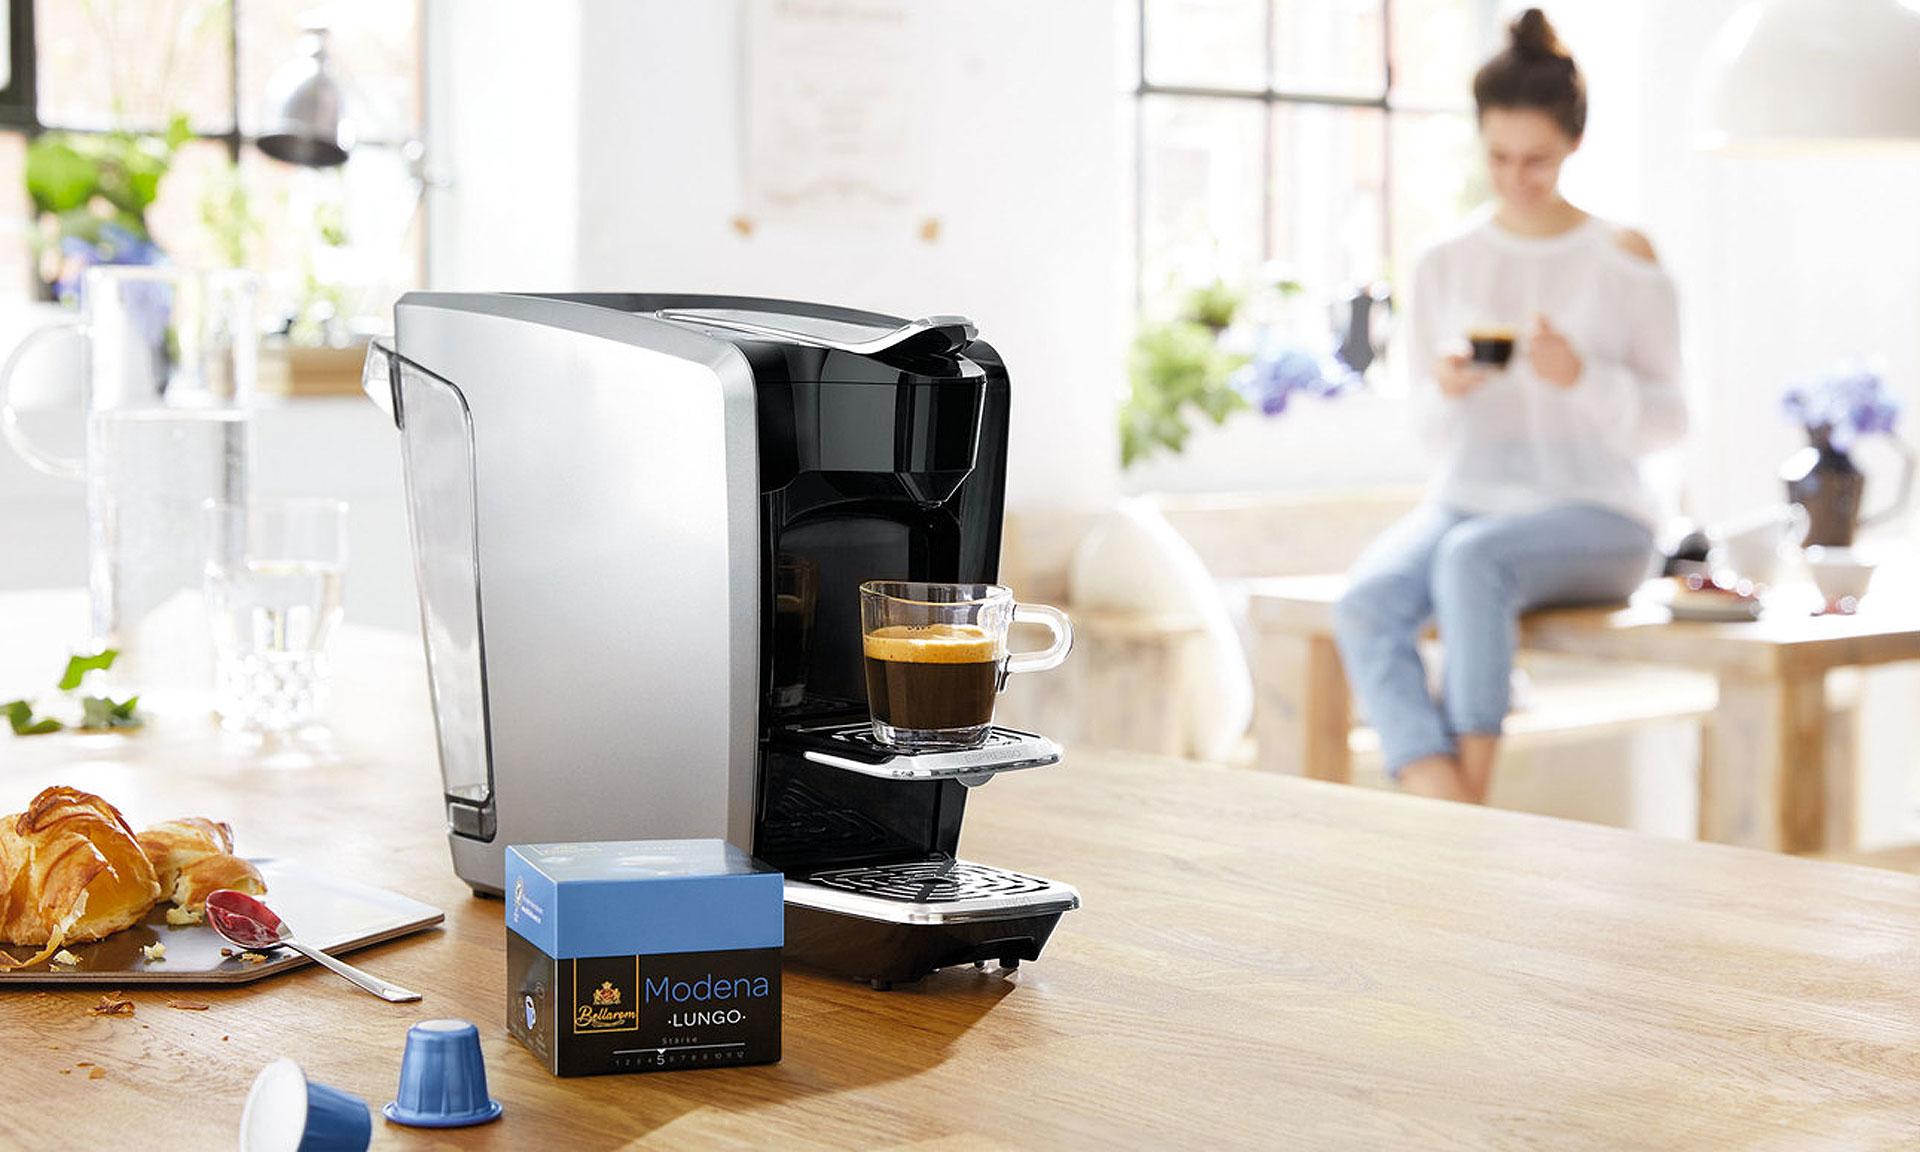 Should You Buy Lidls 50 Nespresso Coffee Machine